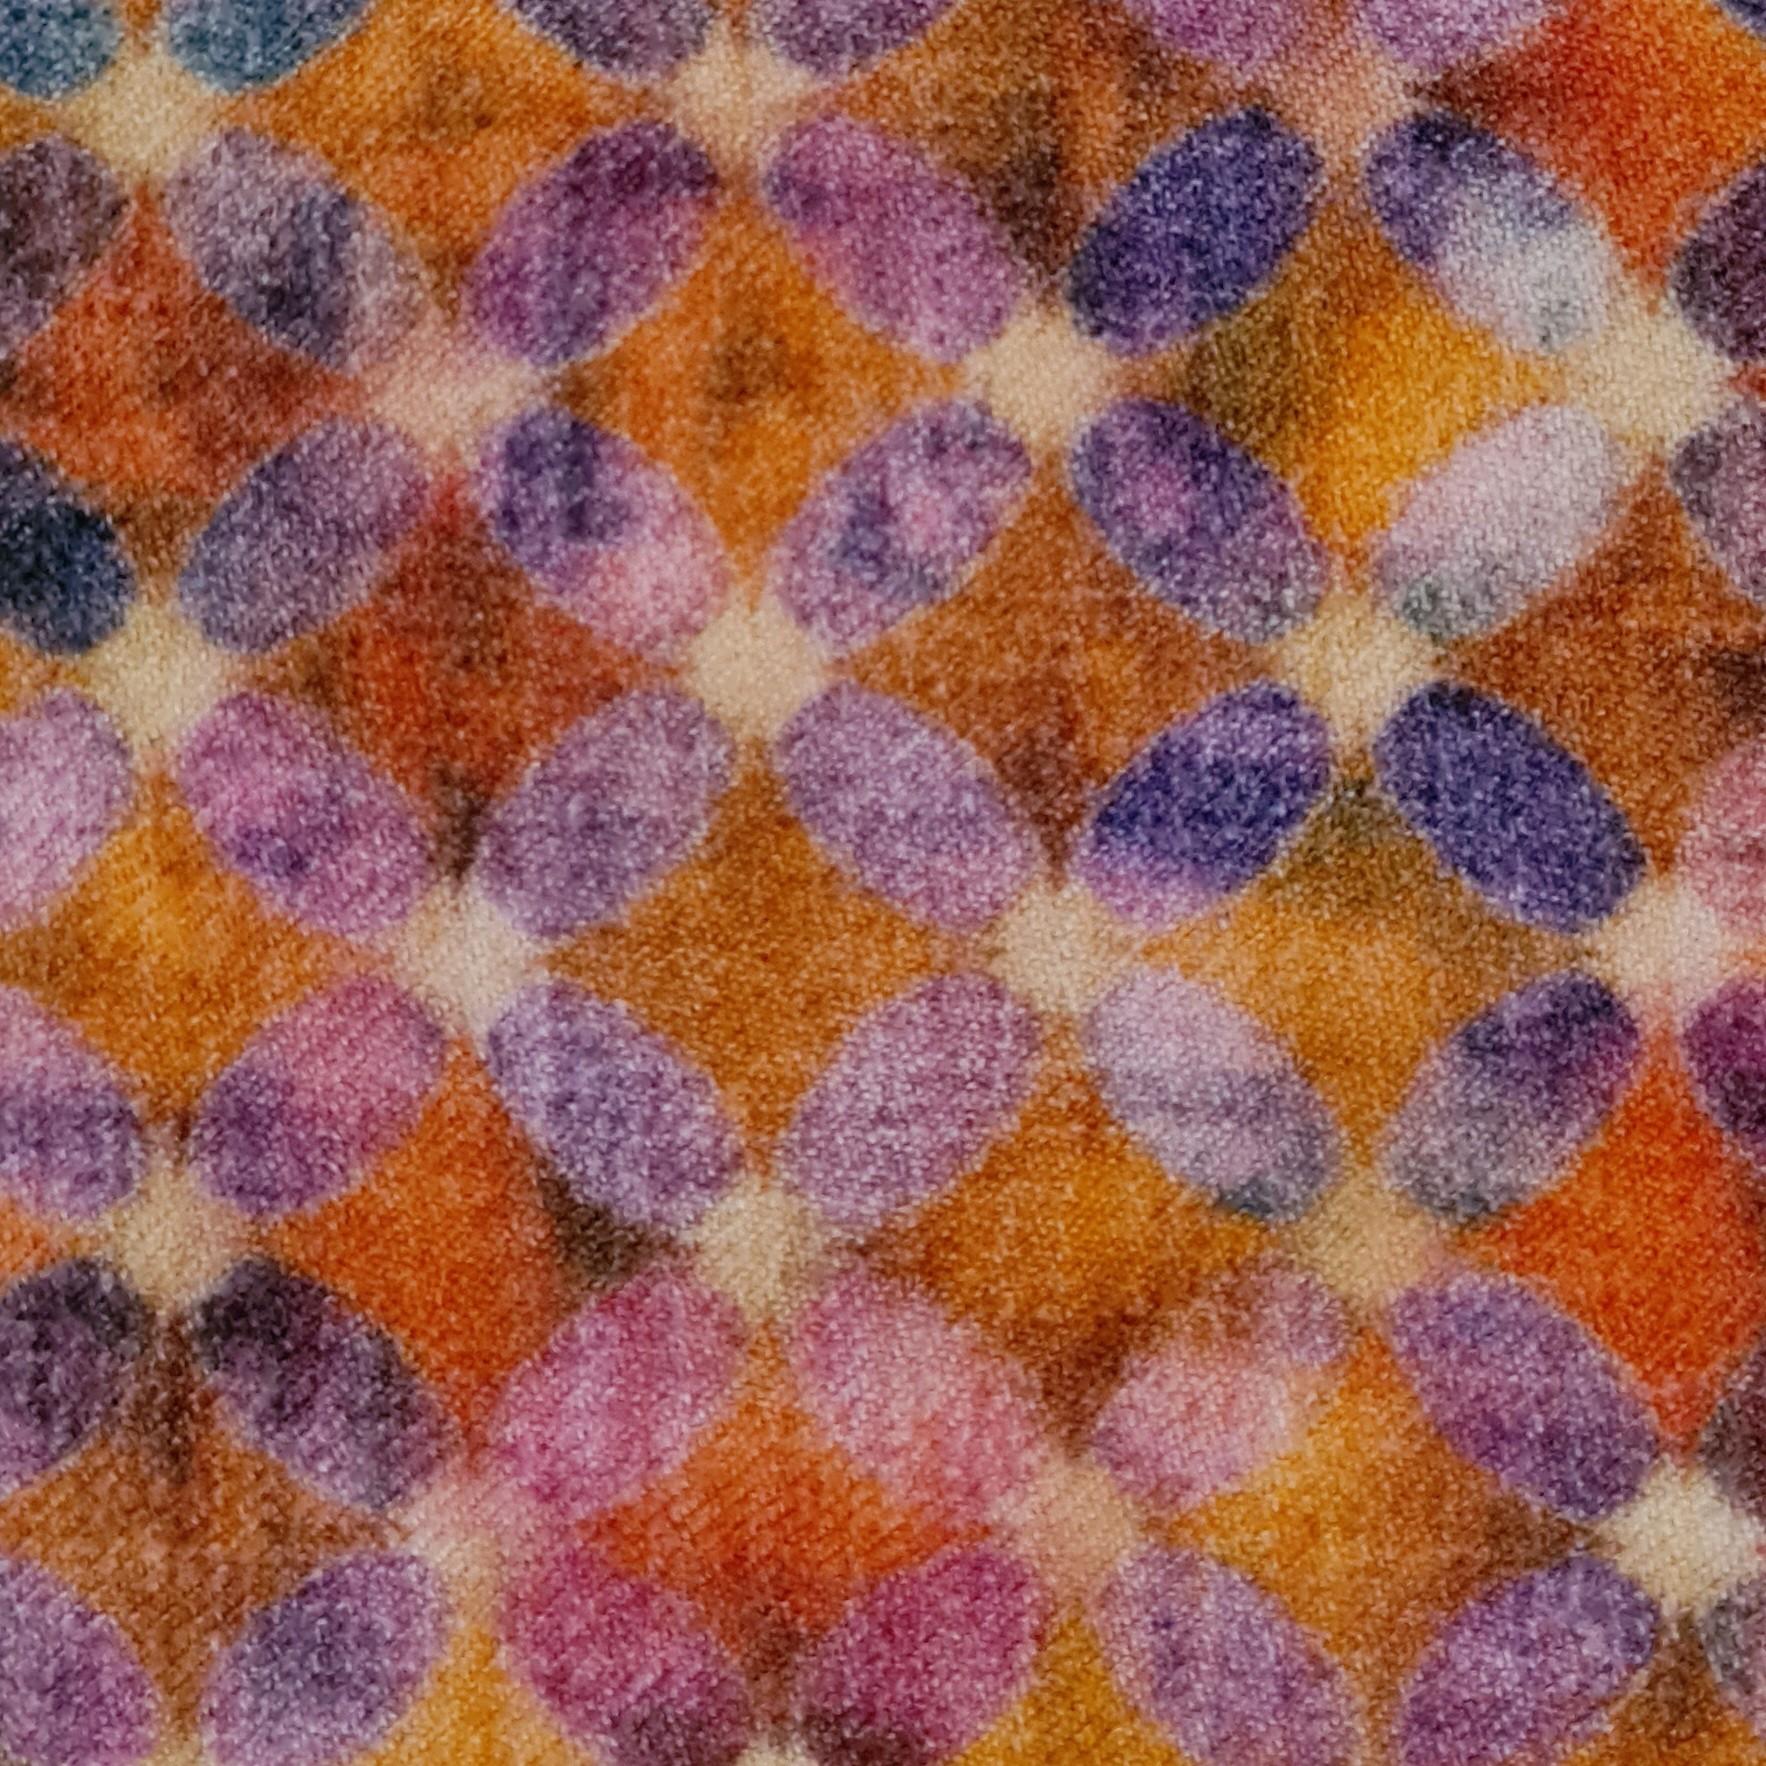 Aquarell Mosaic